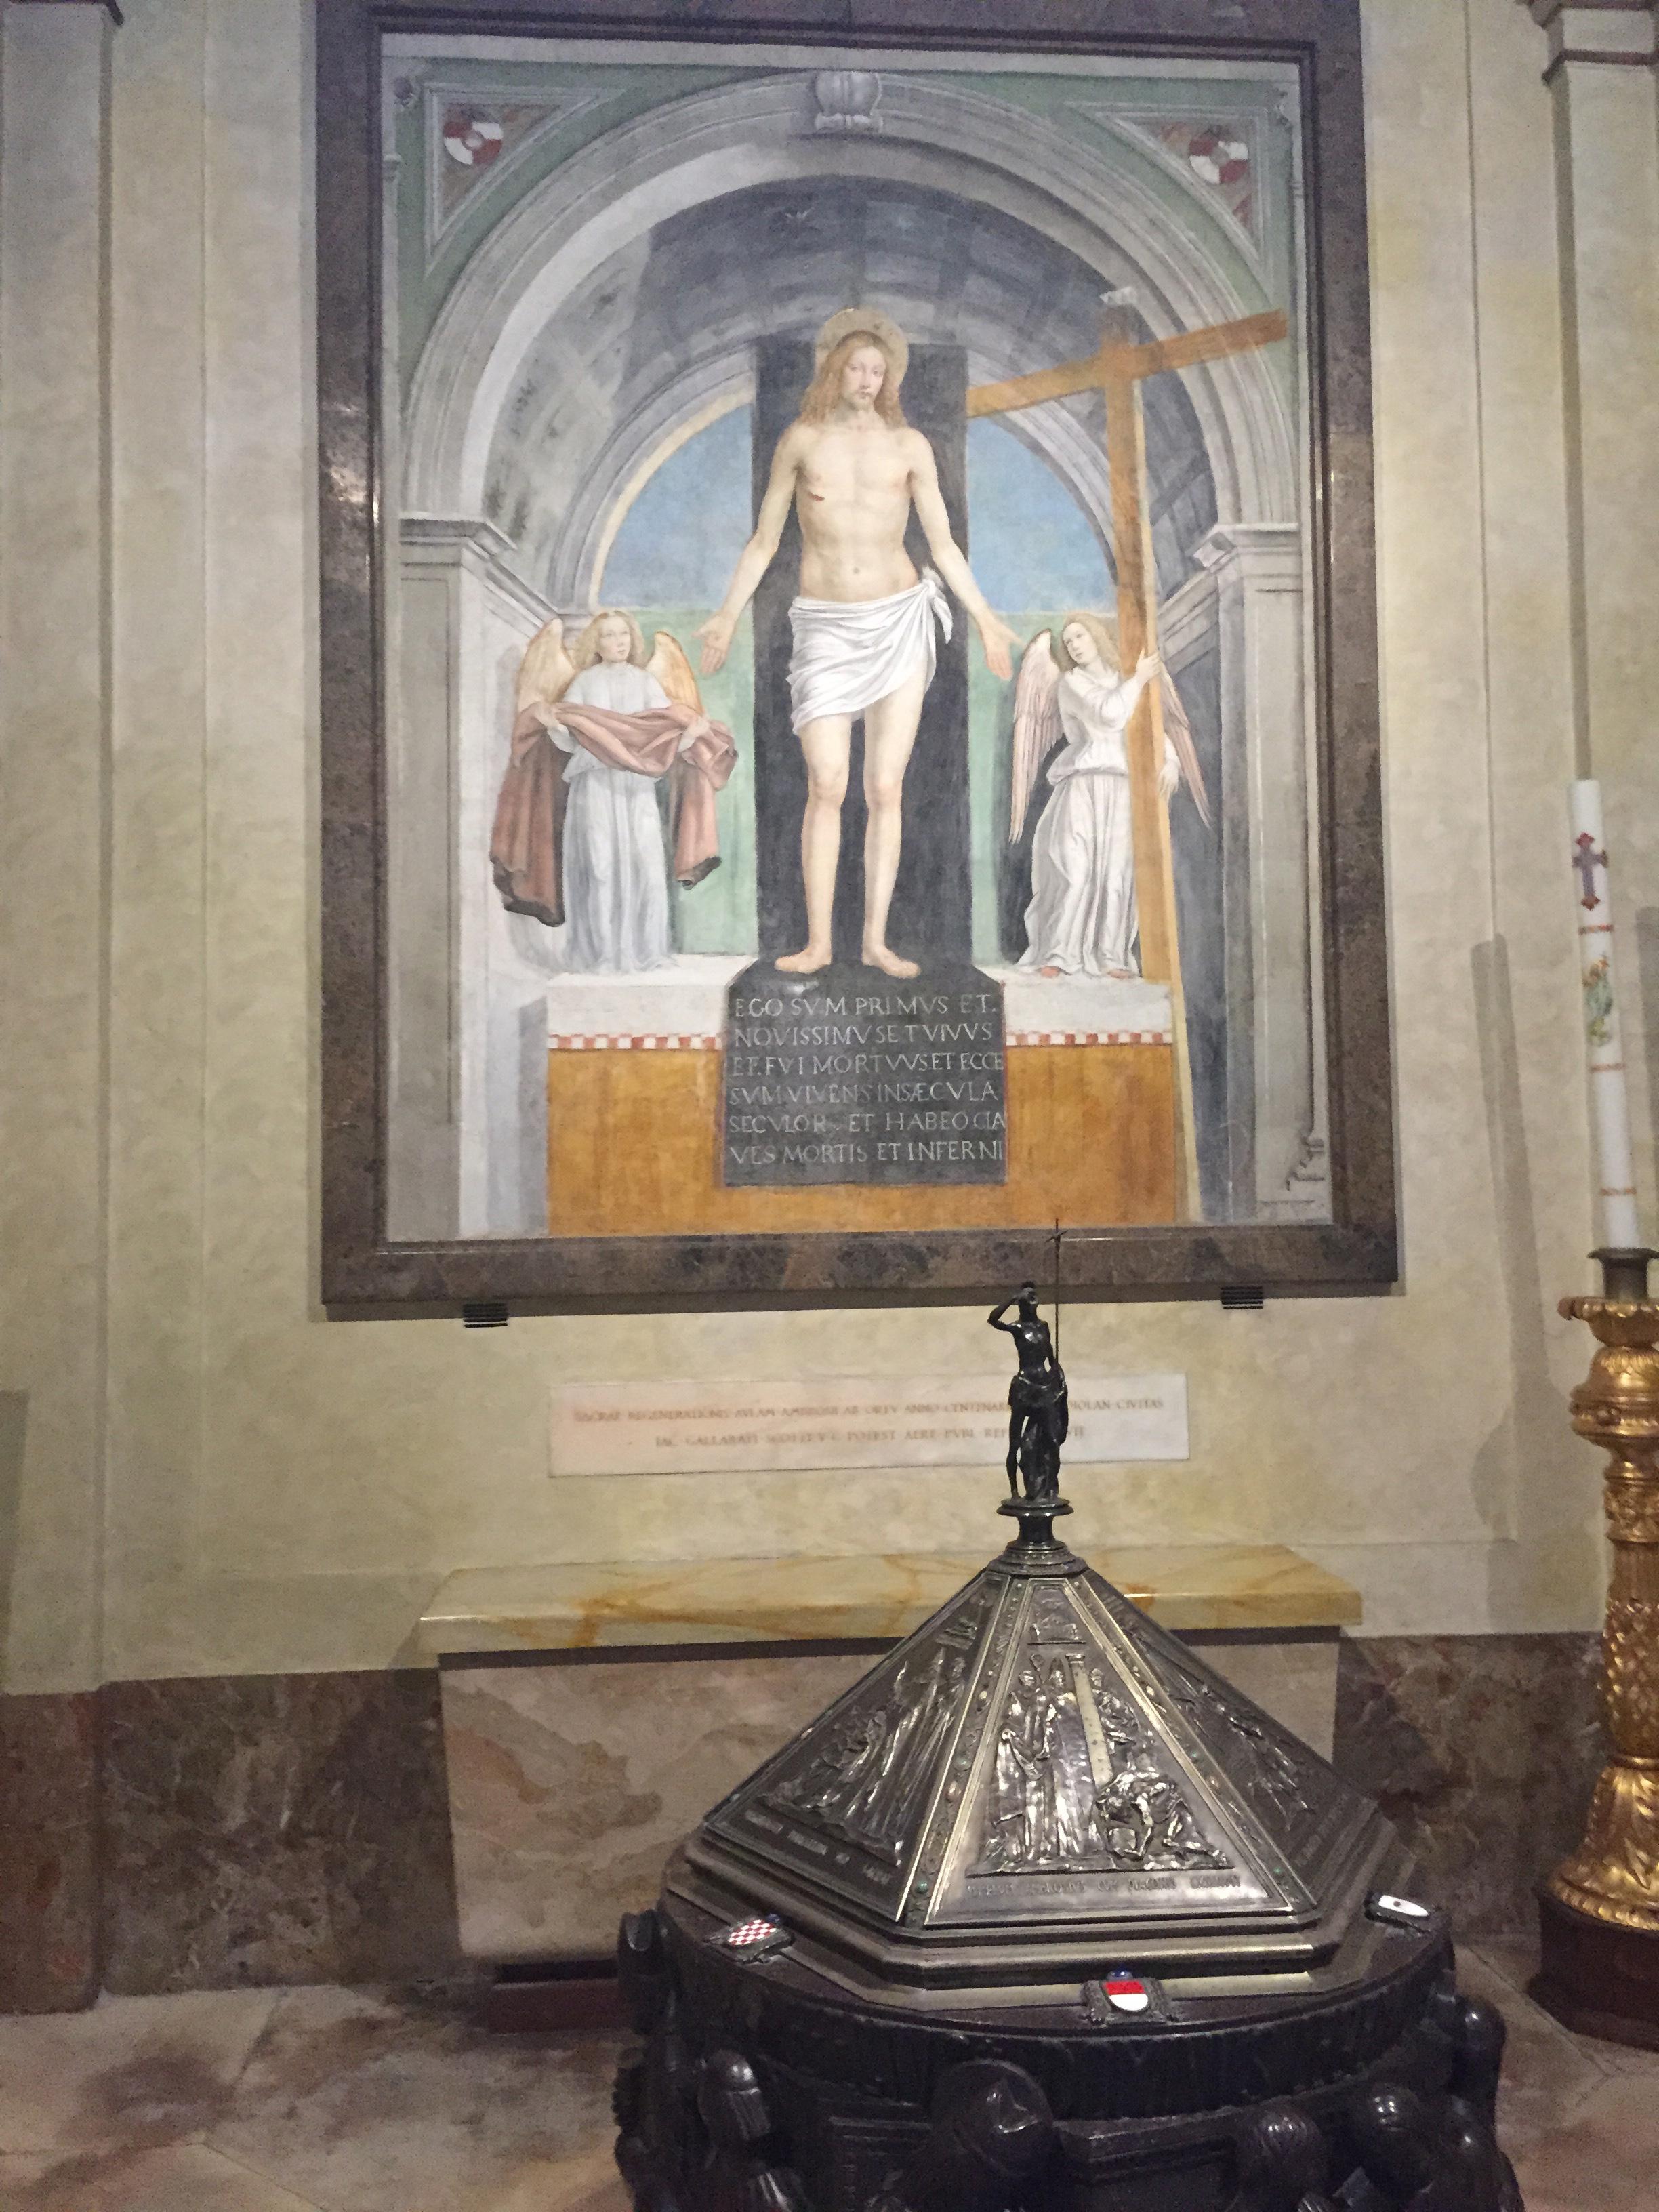 S. Ambrogio great painting